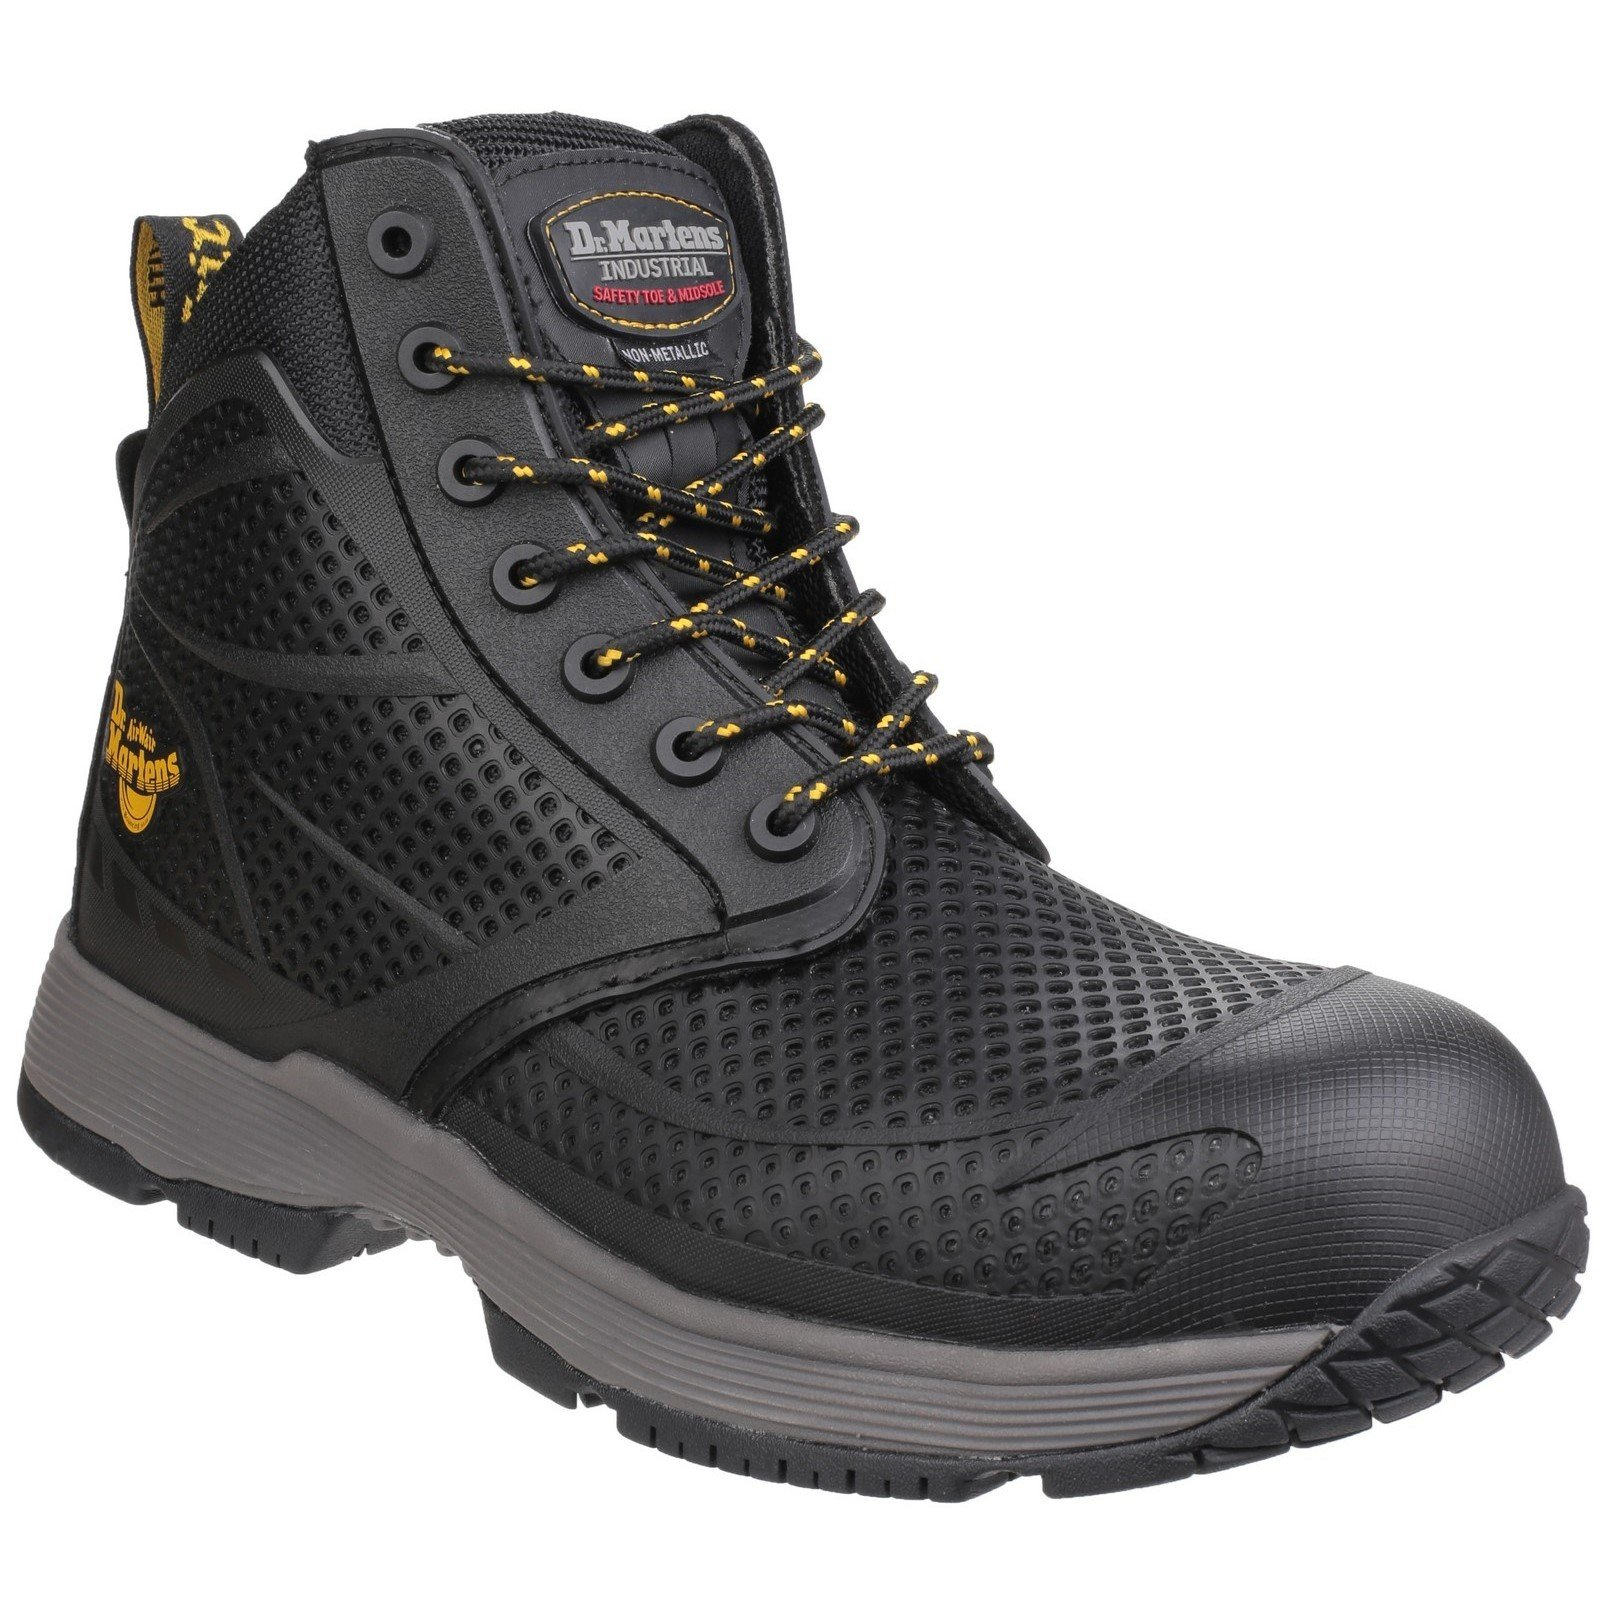 Dr Martens Unisex Calamus Lace up Safety Boot Black 24535-40574 - Black 13